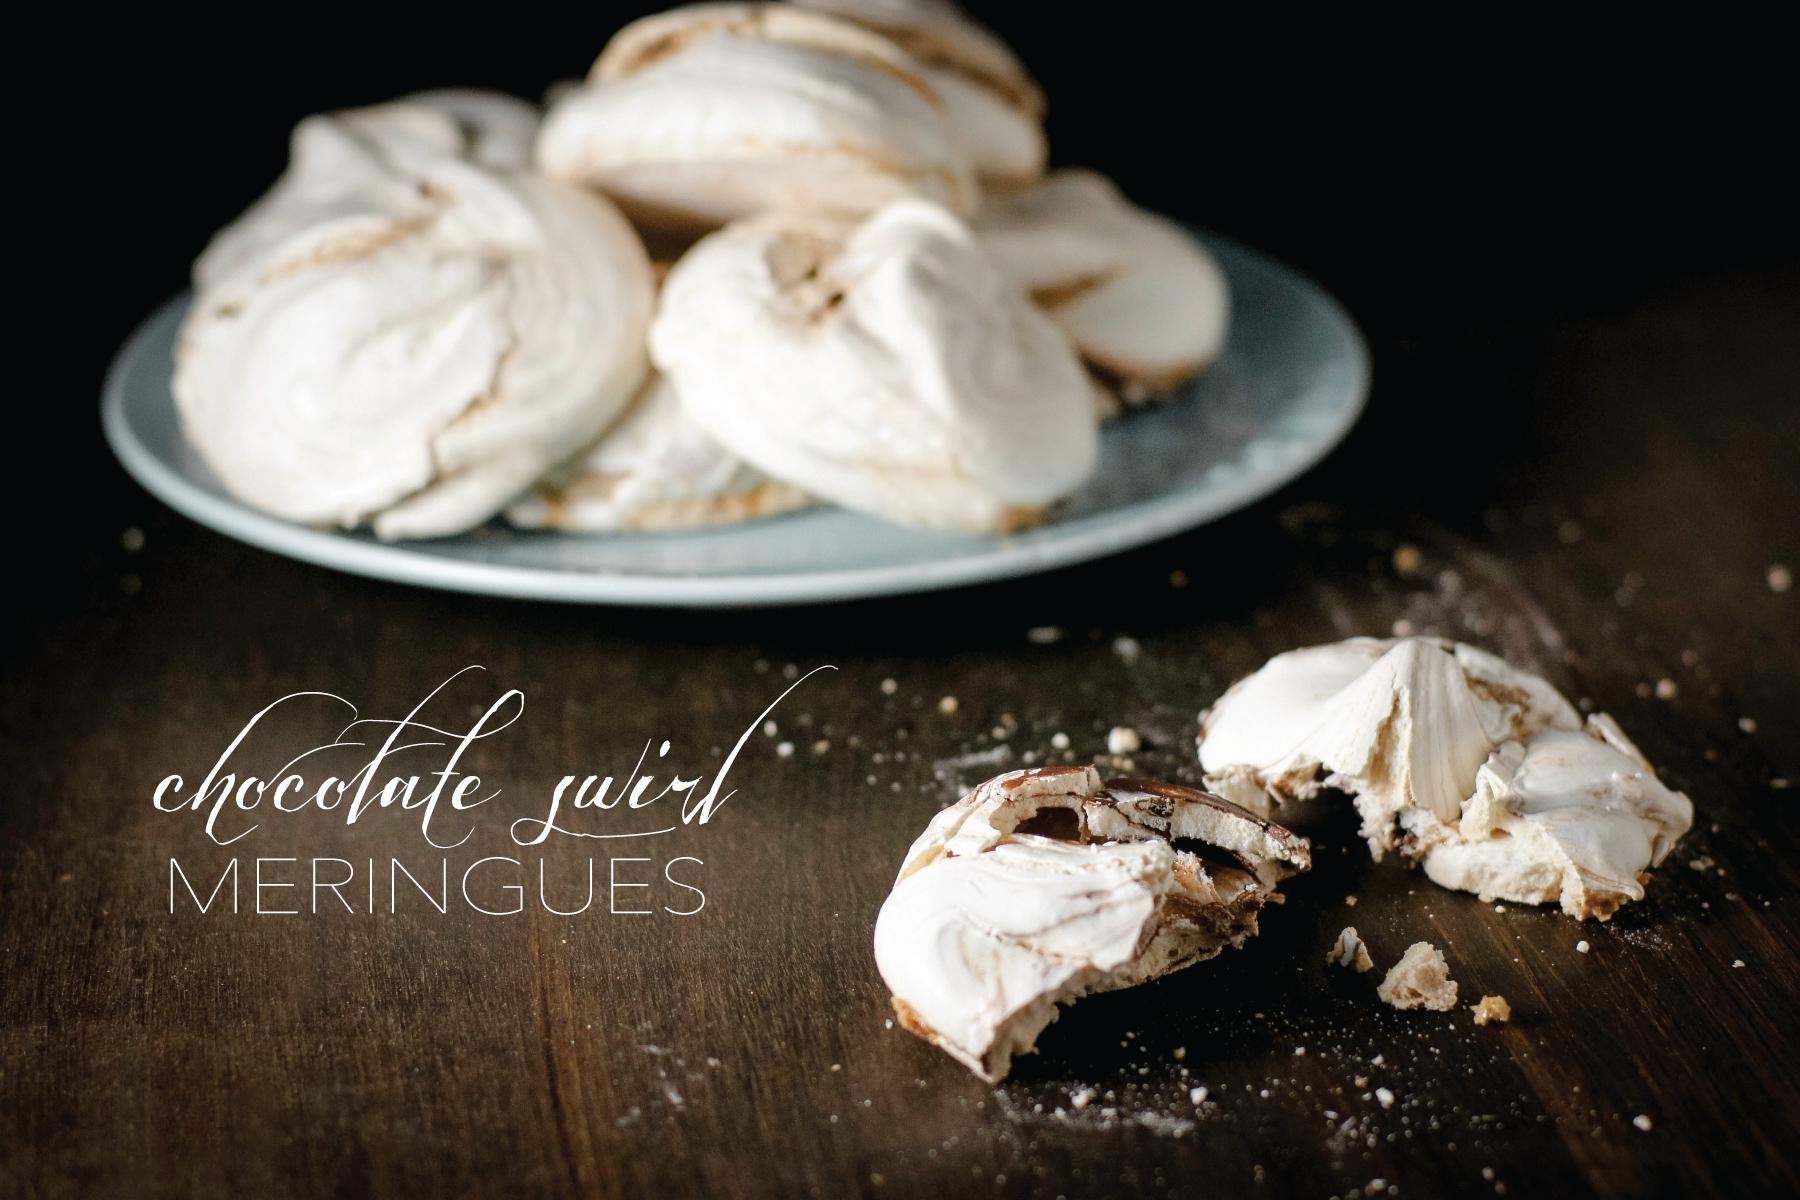 Chocolate Swirl Meringues from Sam Henderson of Today's Nest